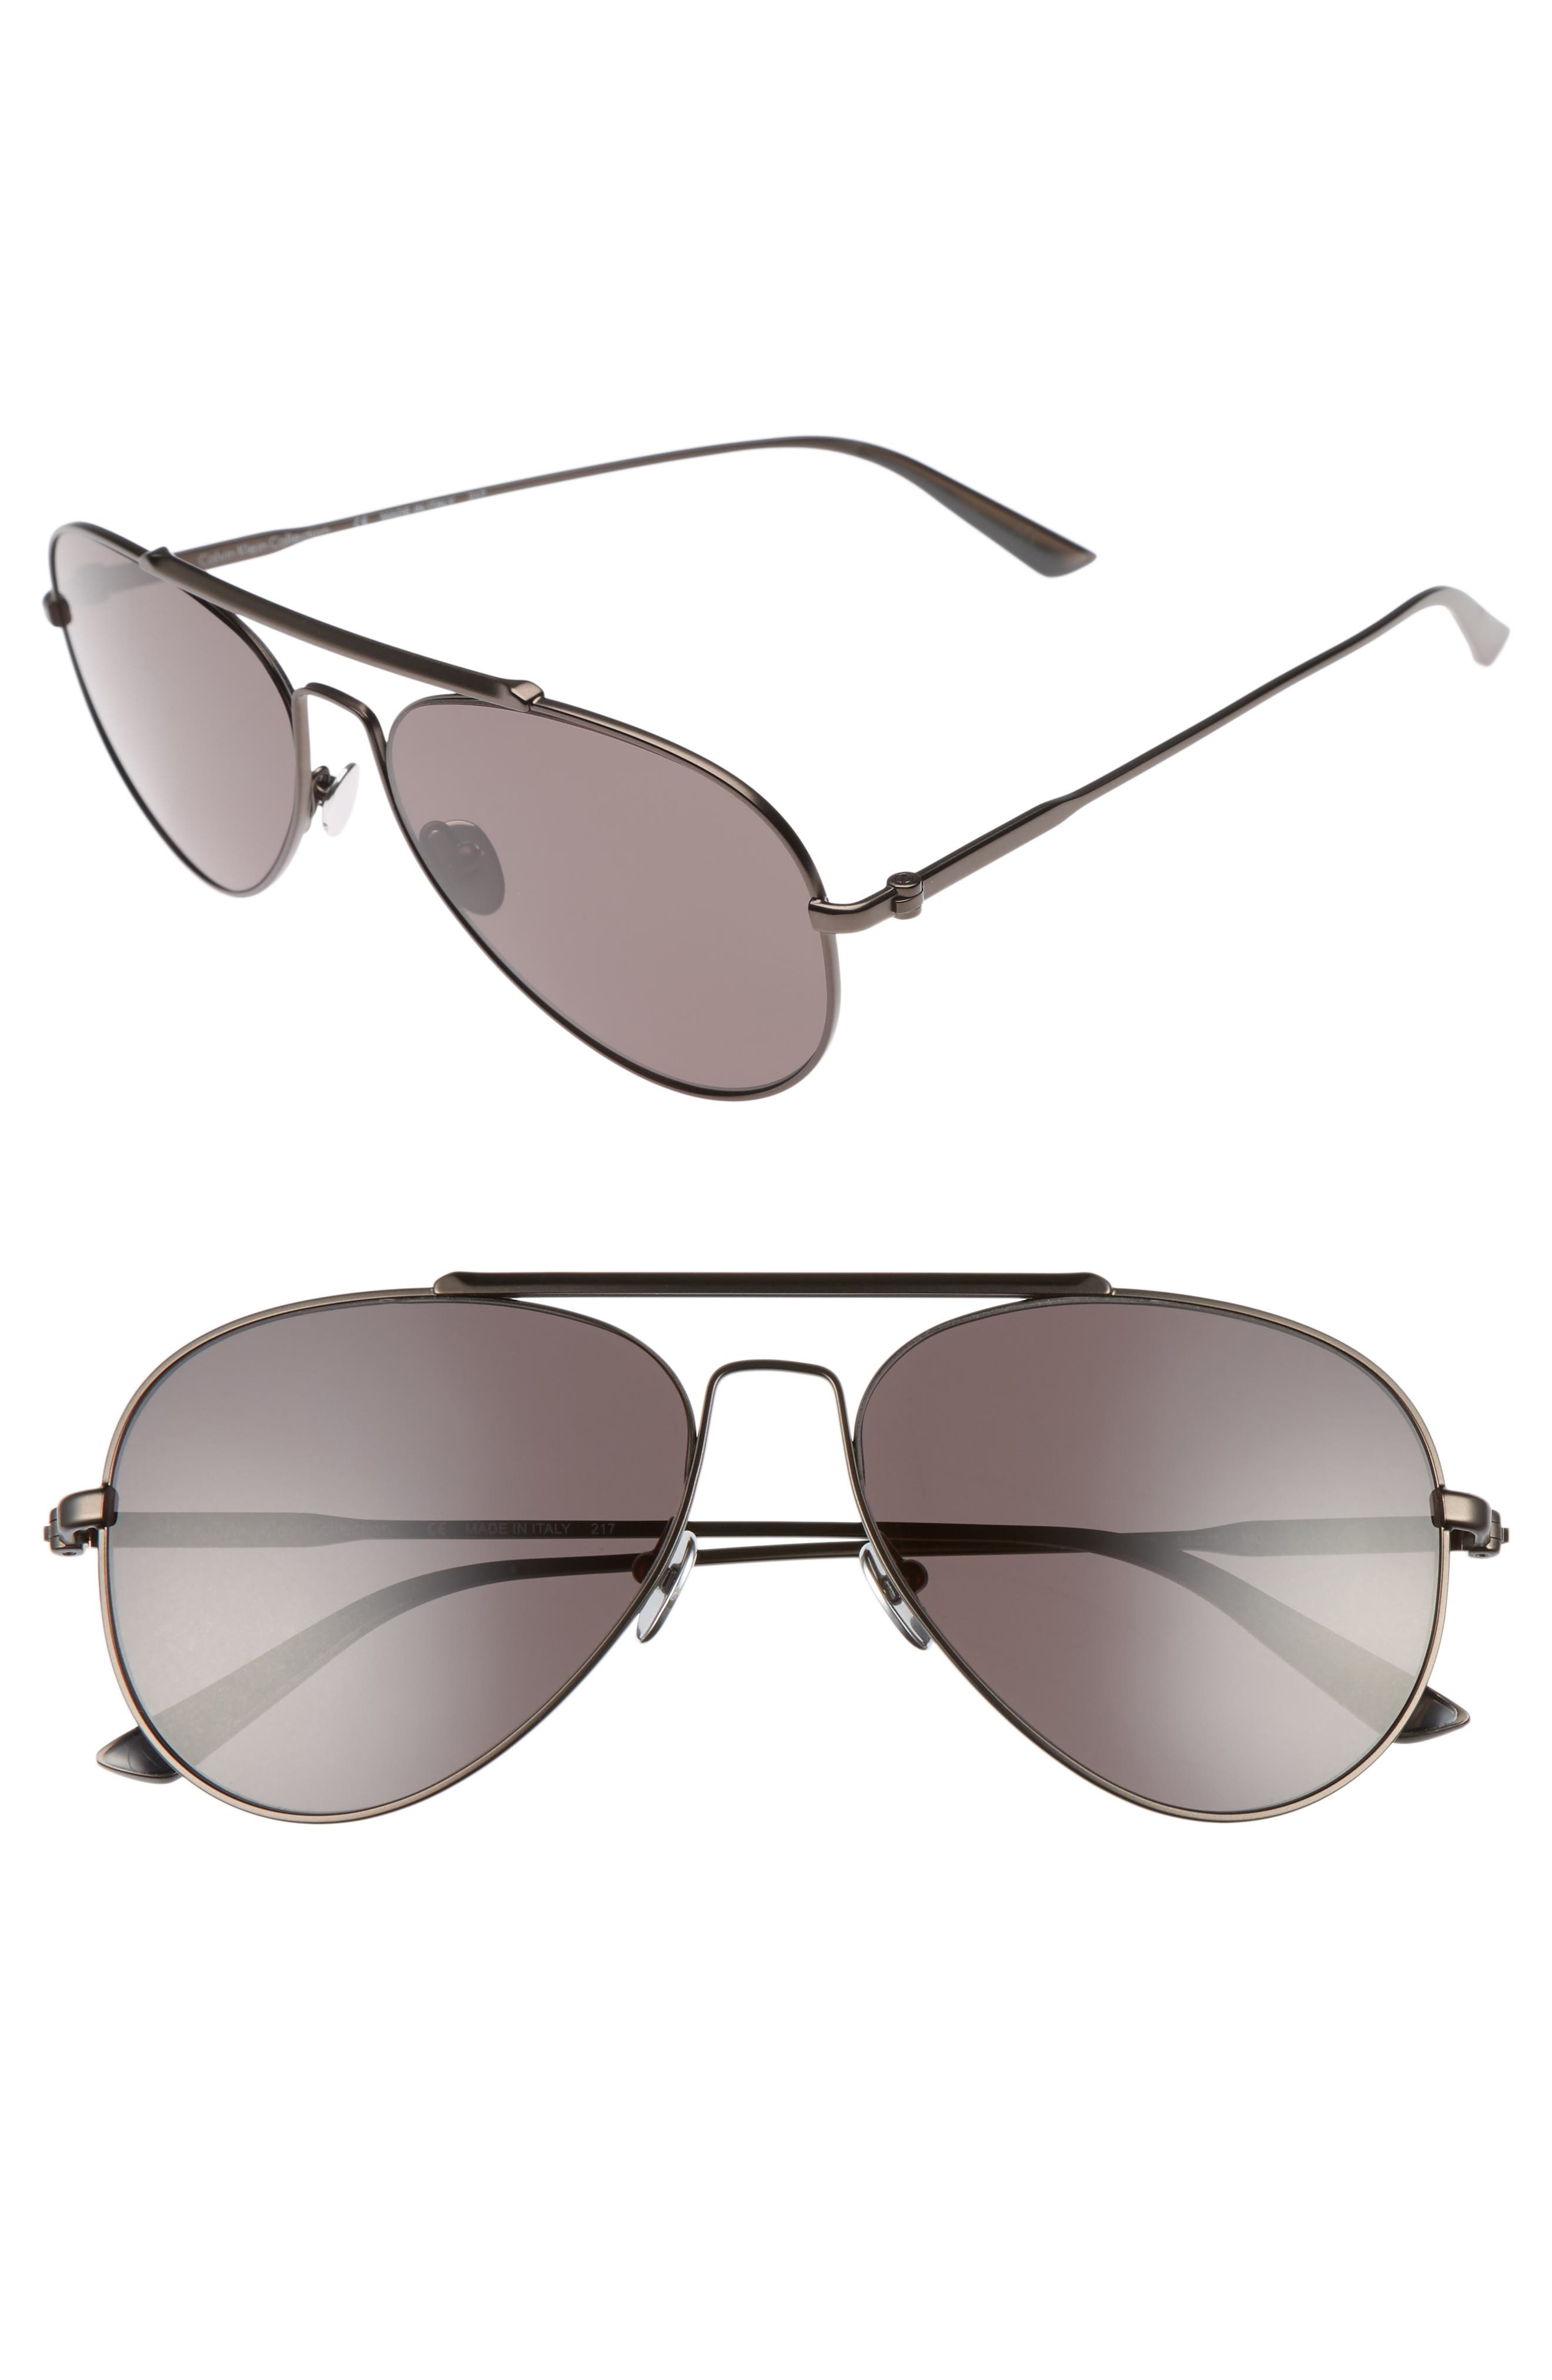 58mm Aviator Sunglasses,                             Main thumbnail 1, color,                             Satin Titanium